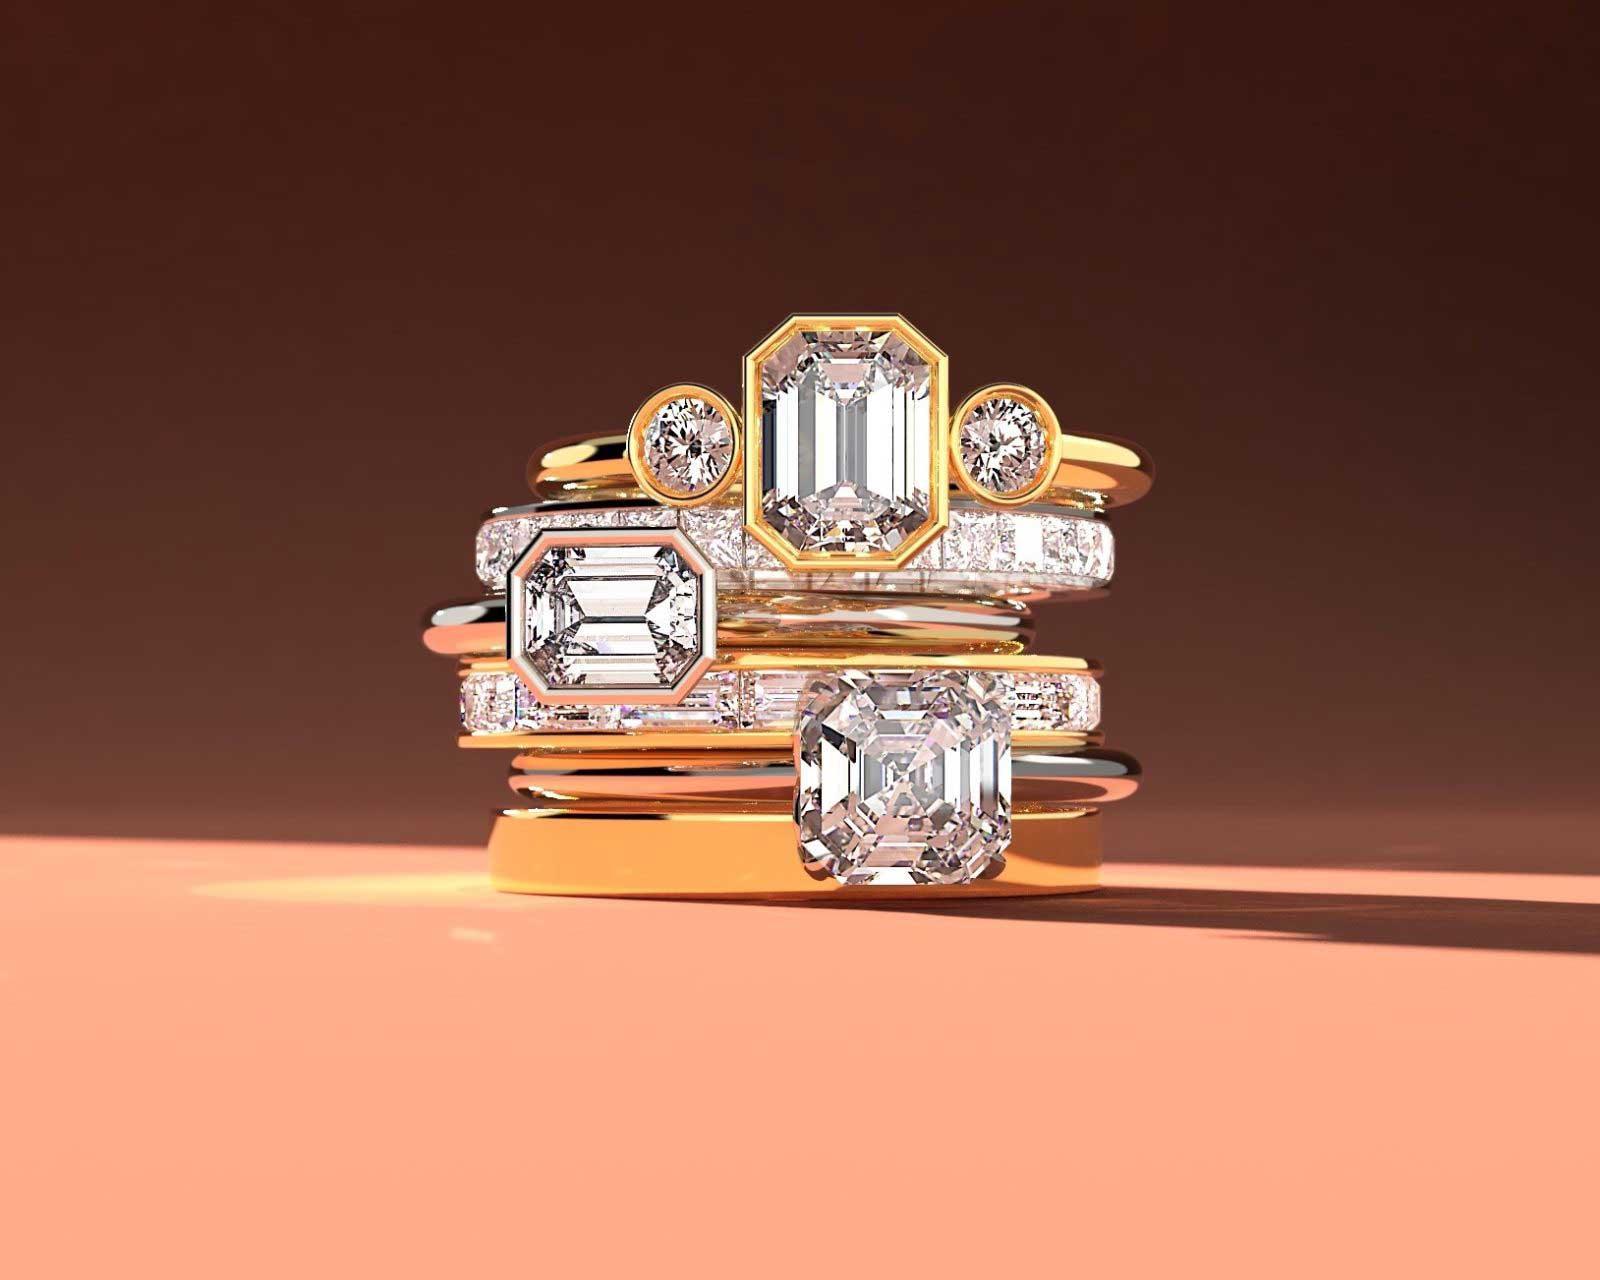 Step-Cut Diamonds